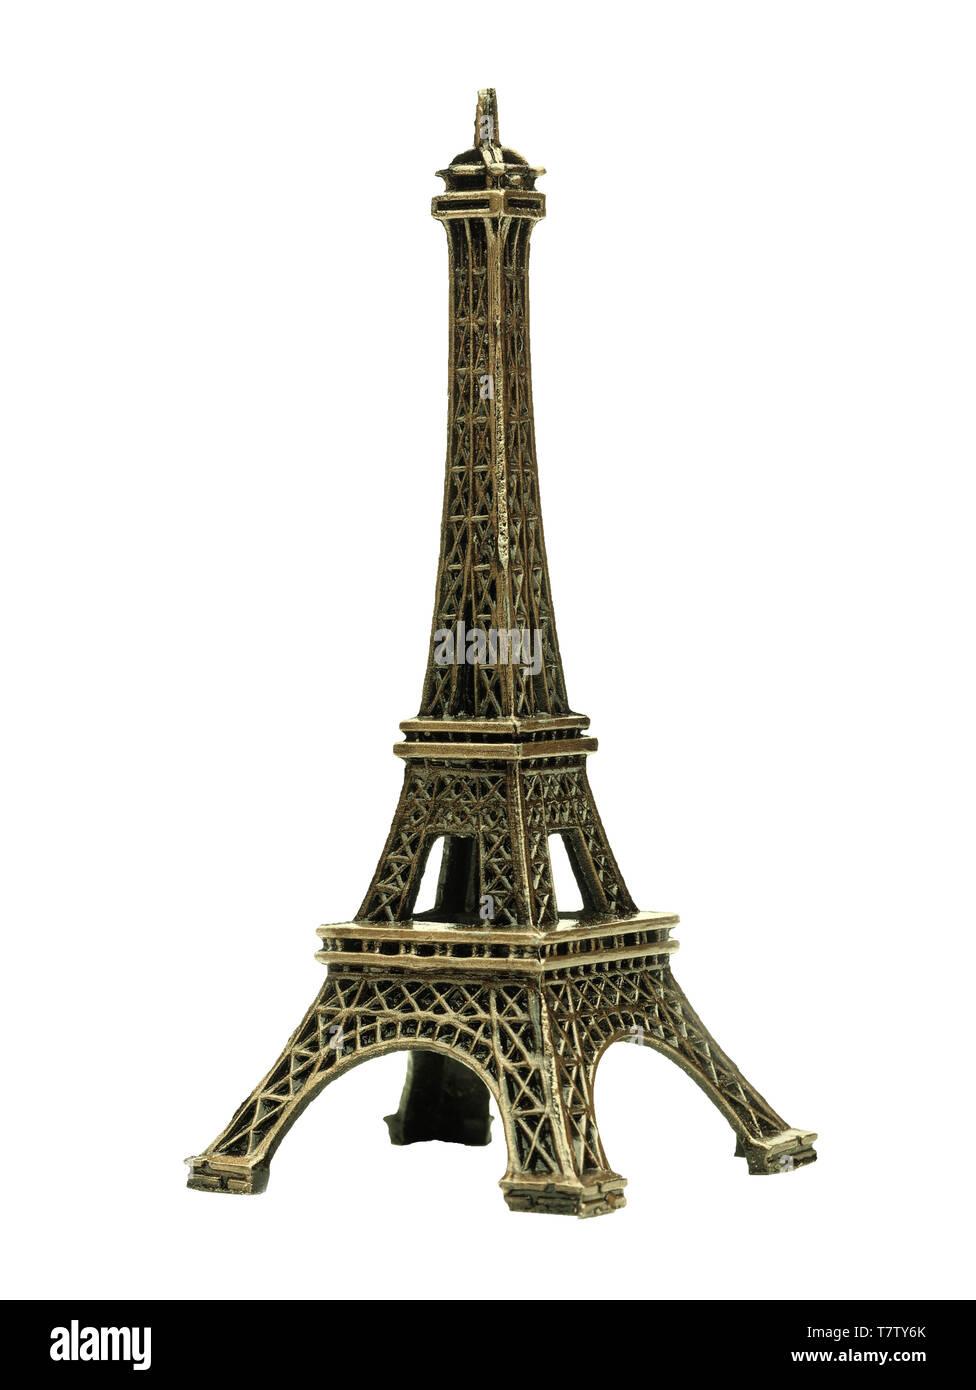 Eiffel tower paris france souvenir isolated on white - Stock Image